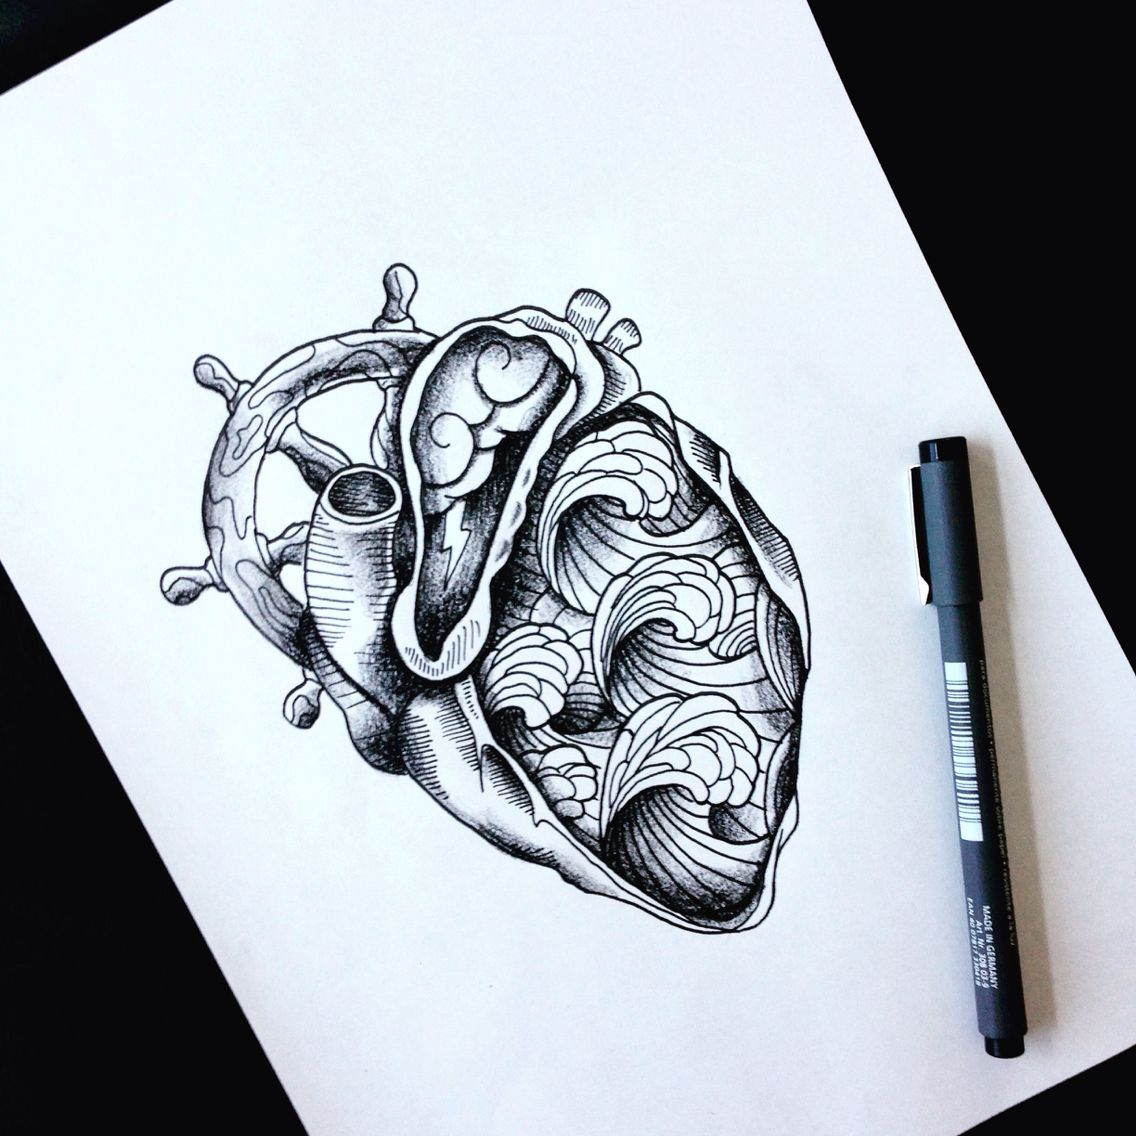 #heart #storm #thunder #helm #waves #tattoo #draw #idea ...